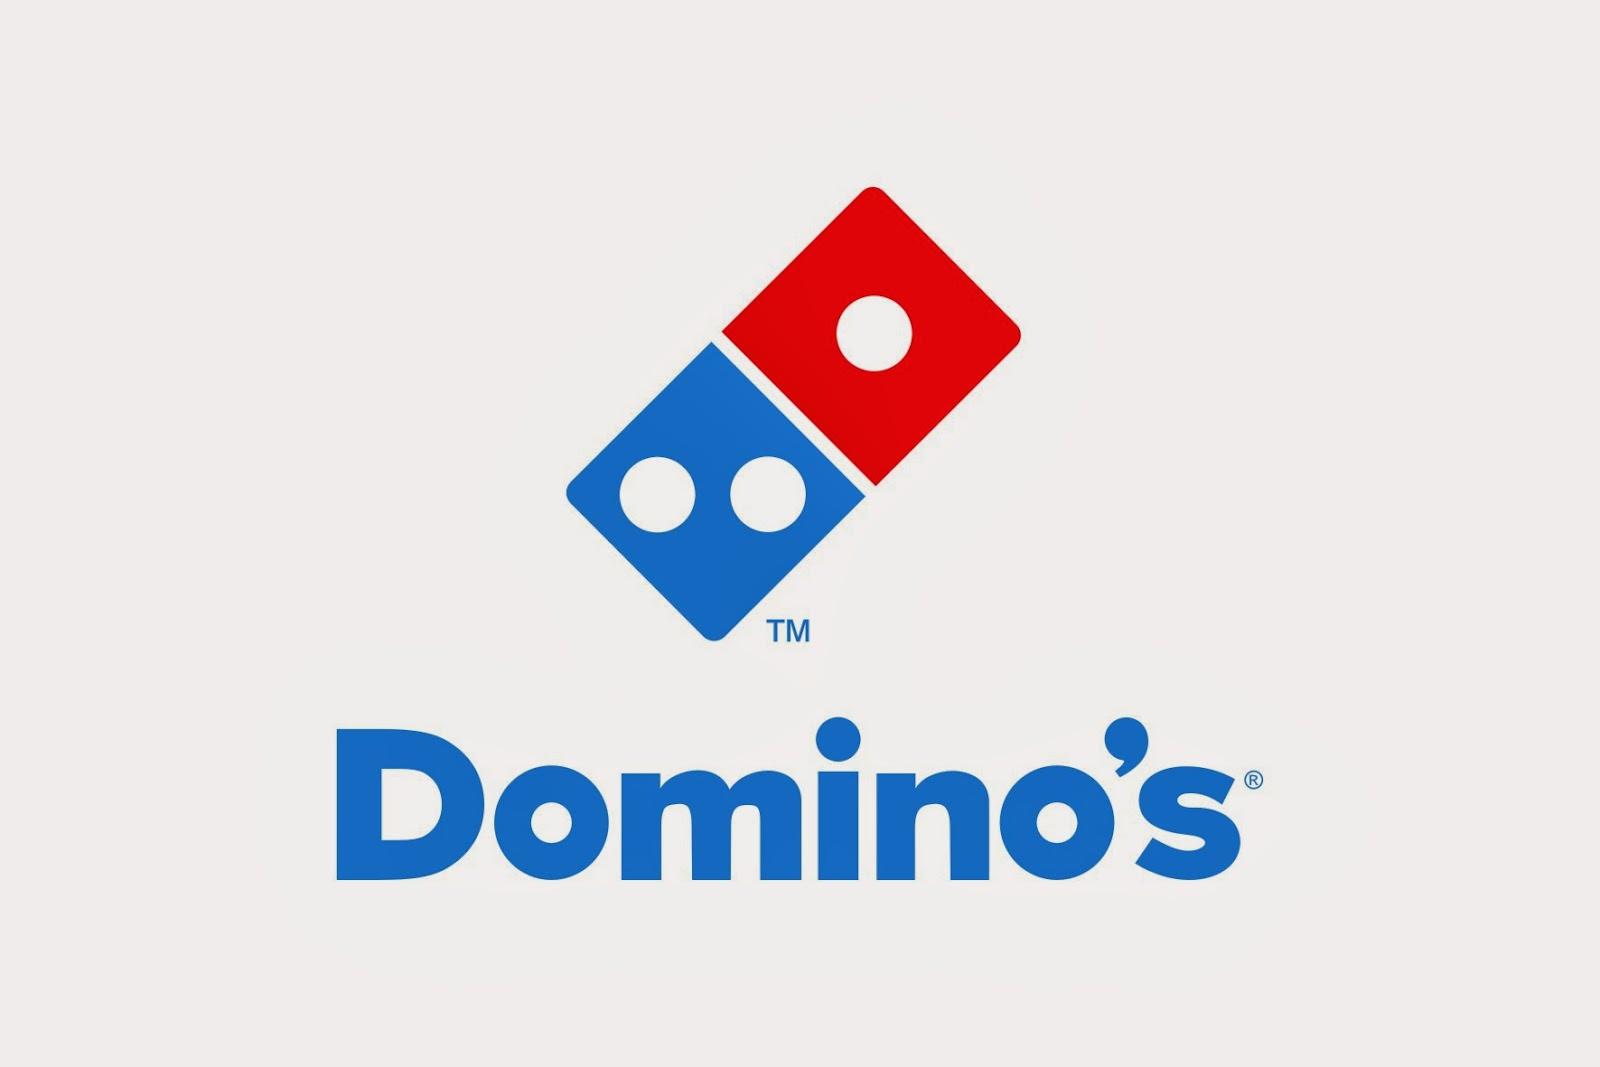 dominos logo logoshare